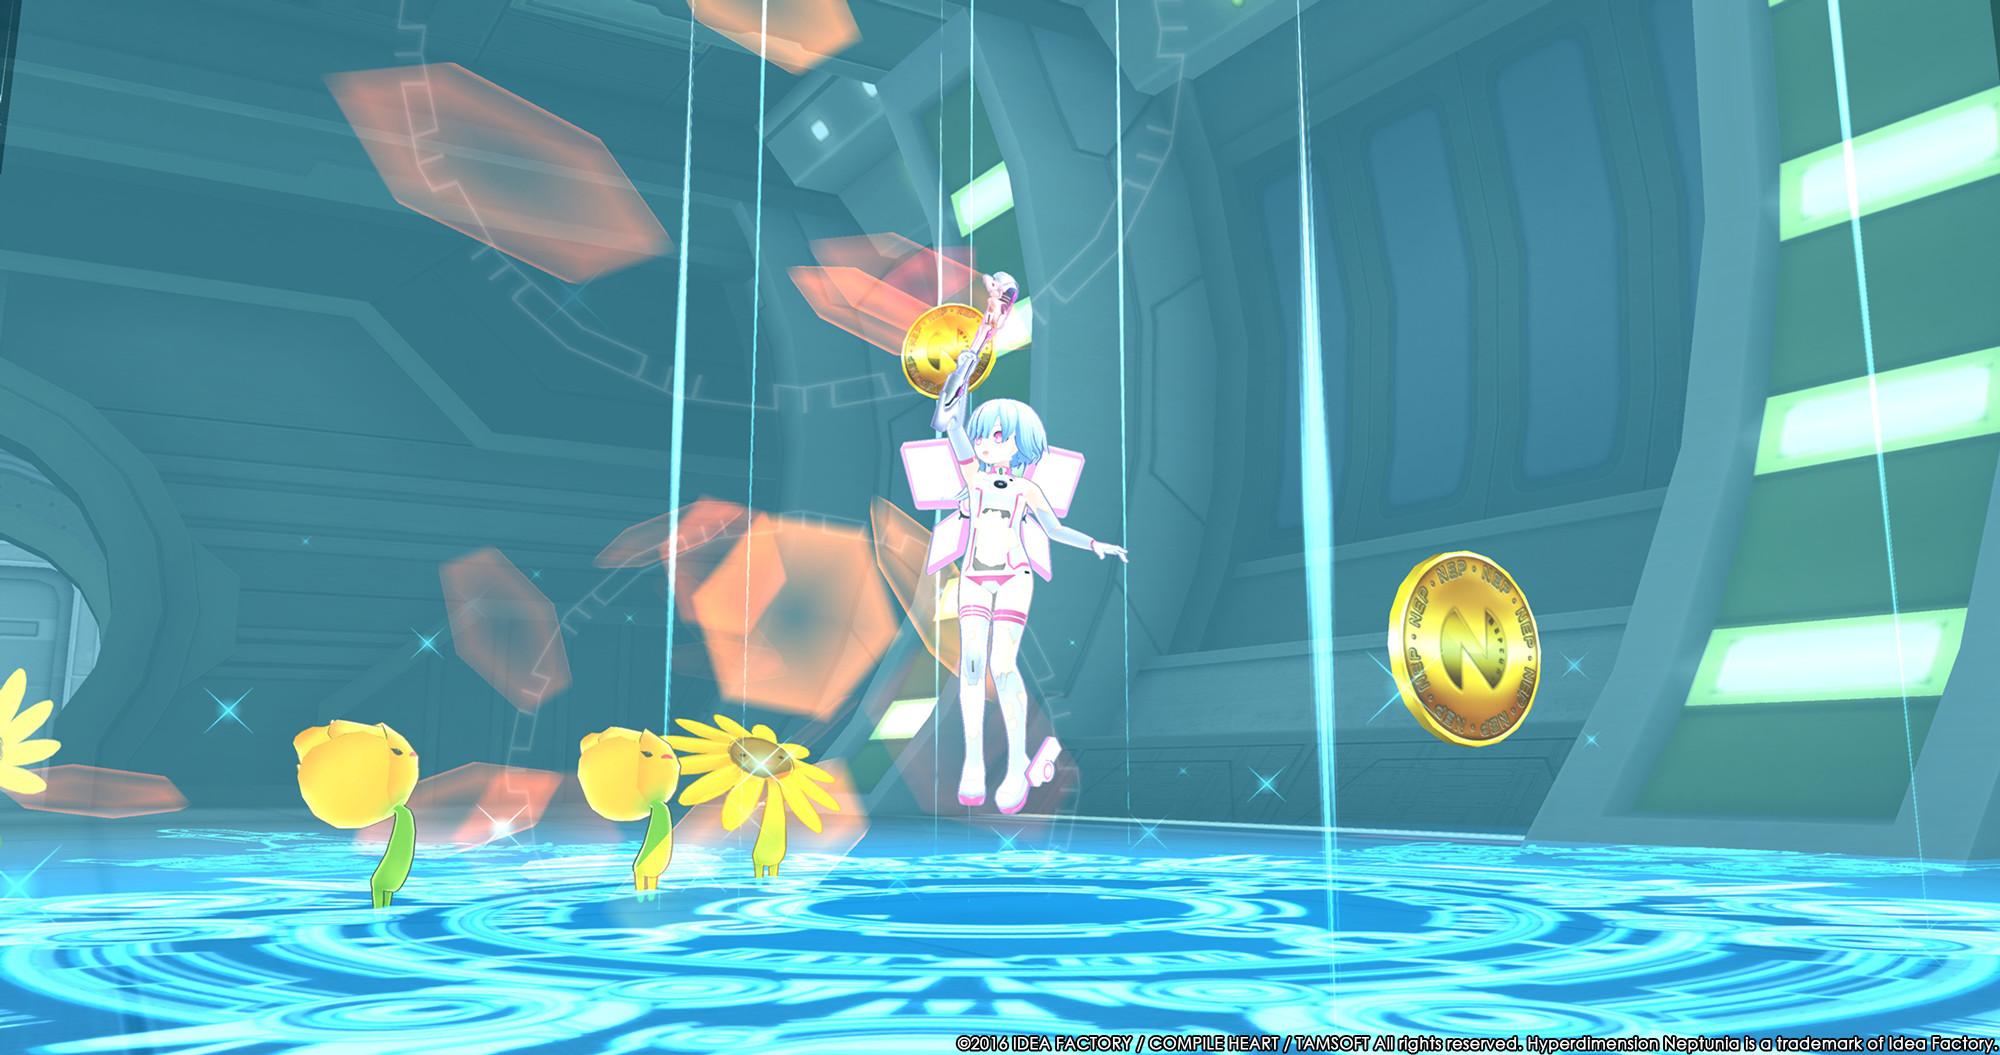 Hyperdimension Neptunia U Action Unleashed Repack